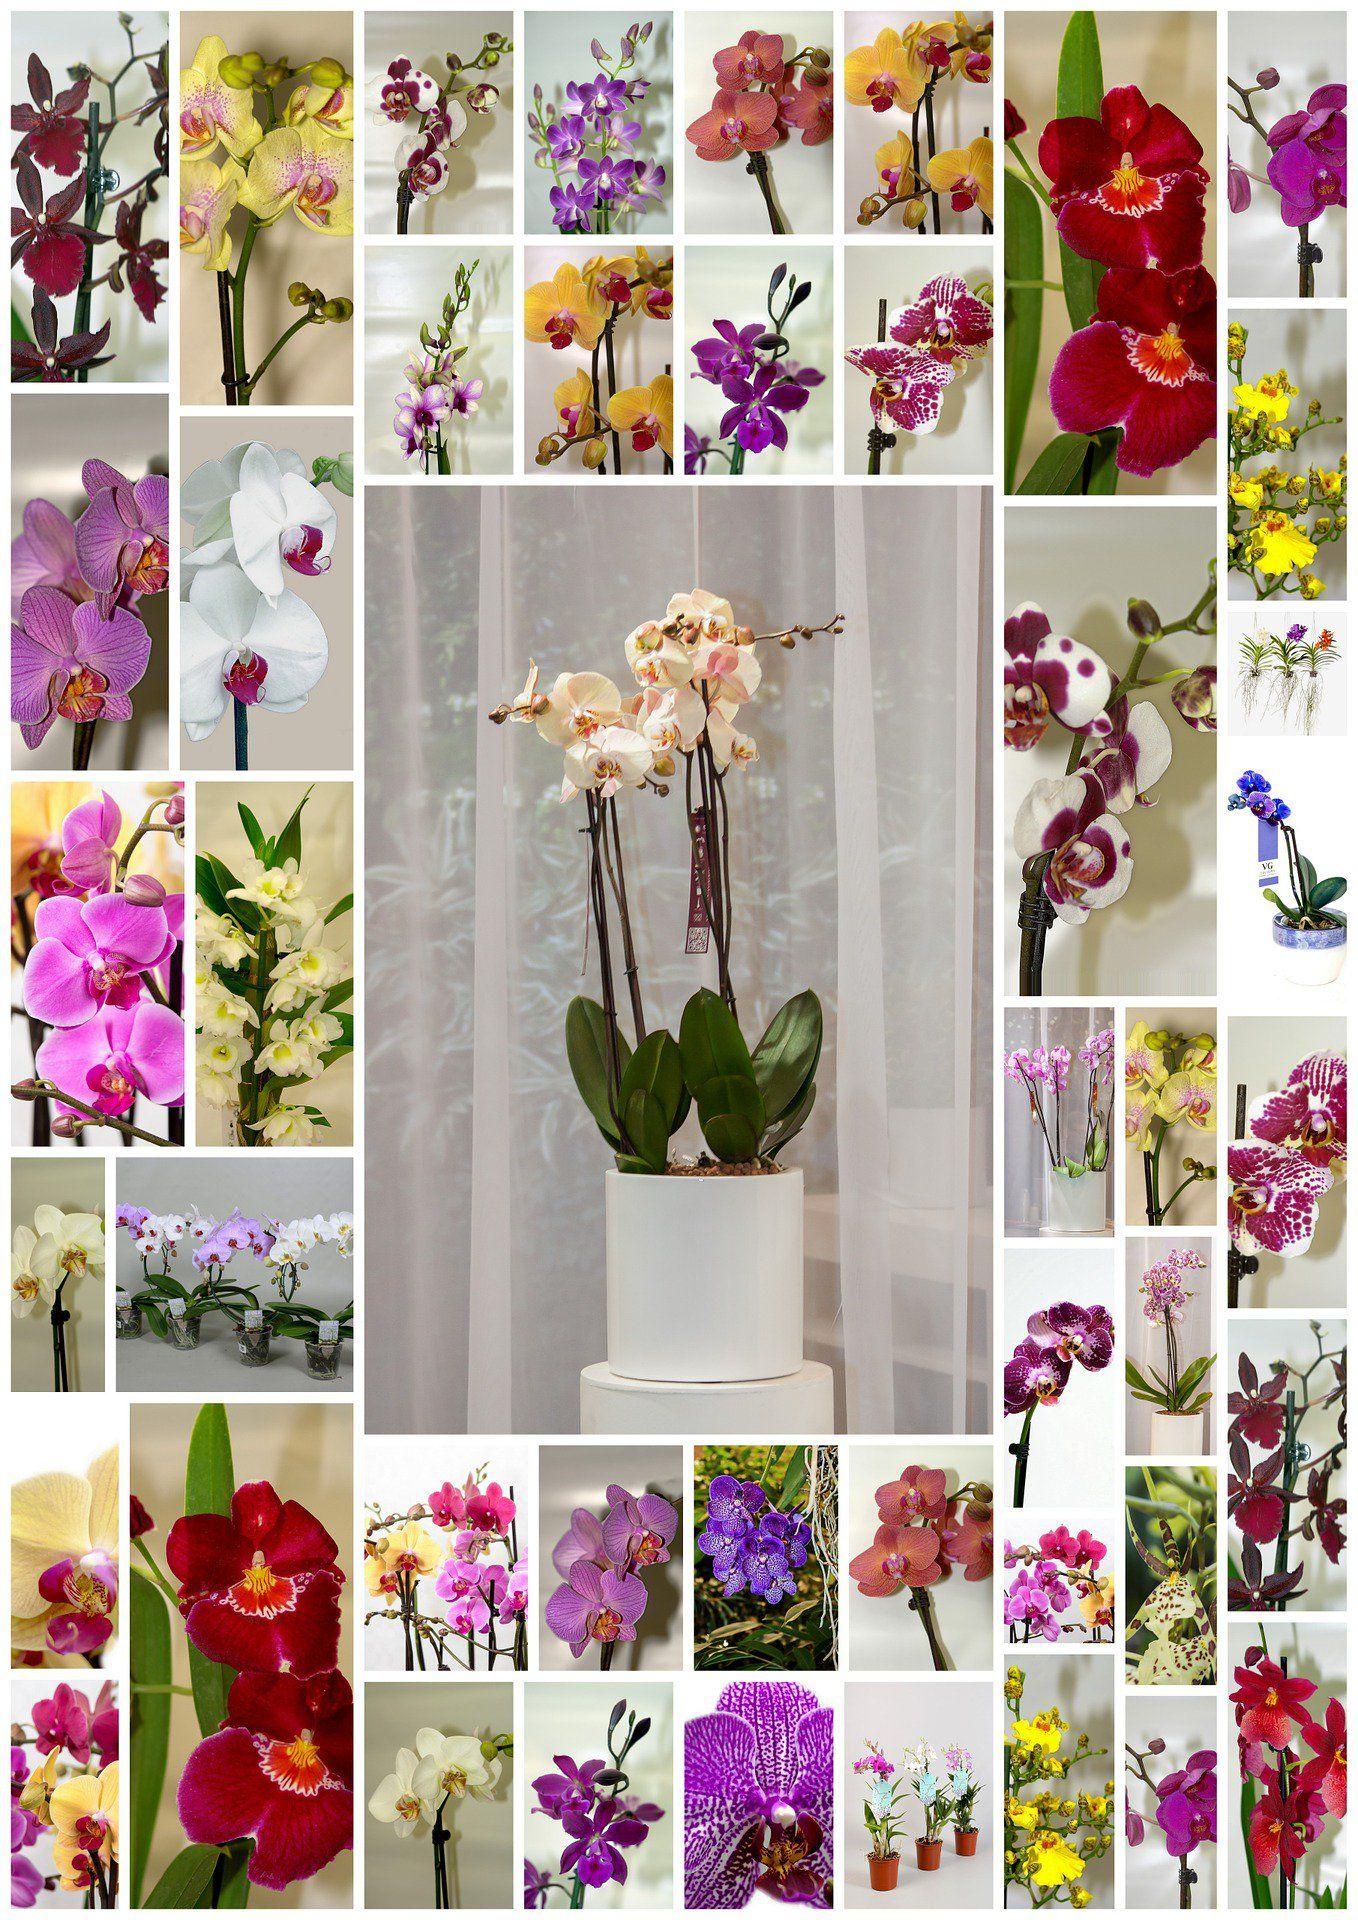 Phalaenopsis orchids care how to plant grow u grow stepbystep